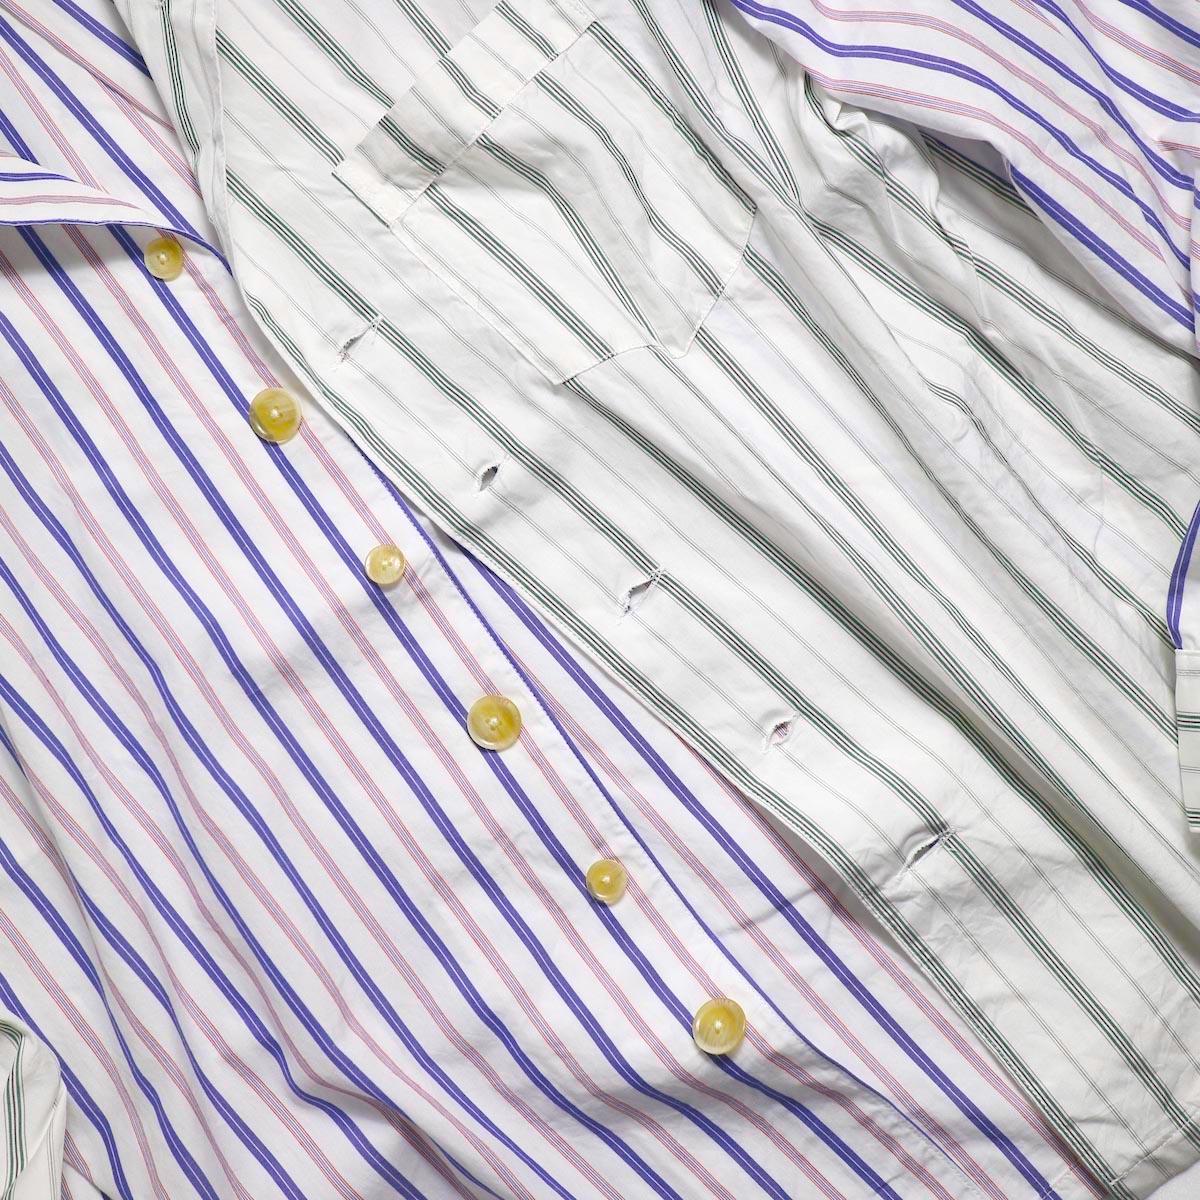 AiE / PJ Shirt -Regent St. (Red/Blu/Wht) ボタン